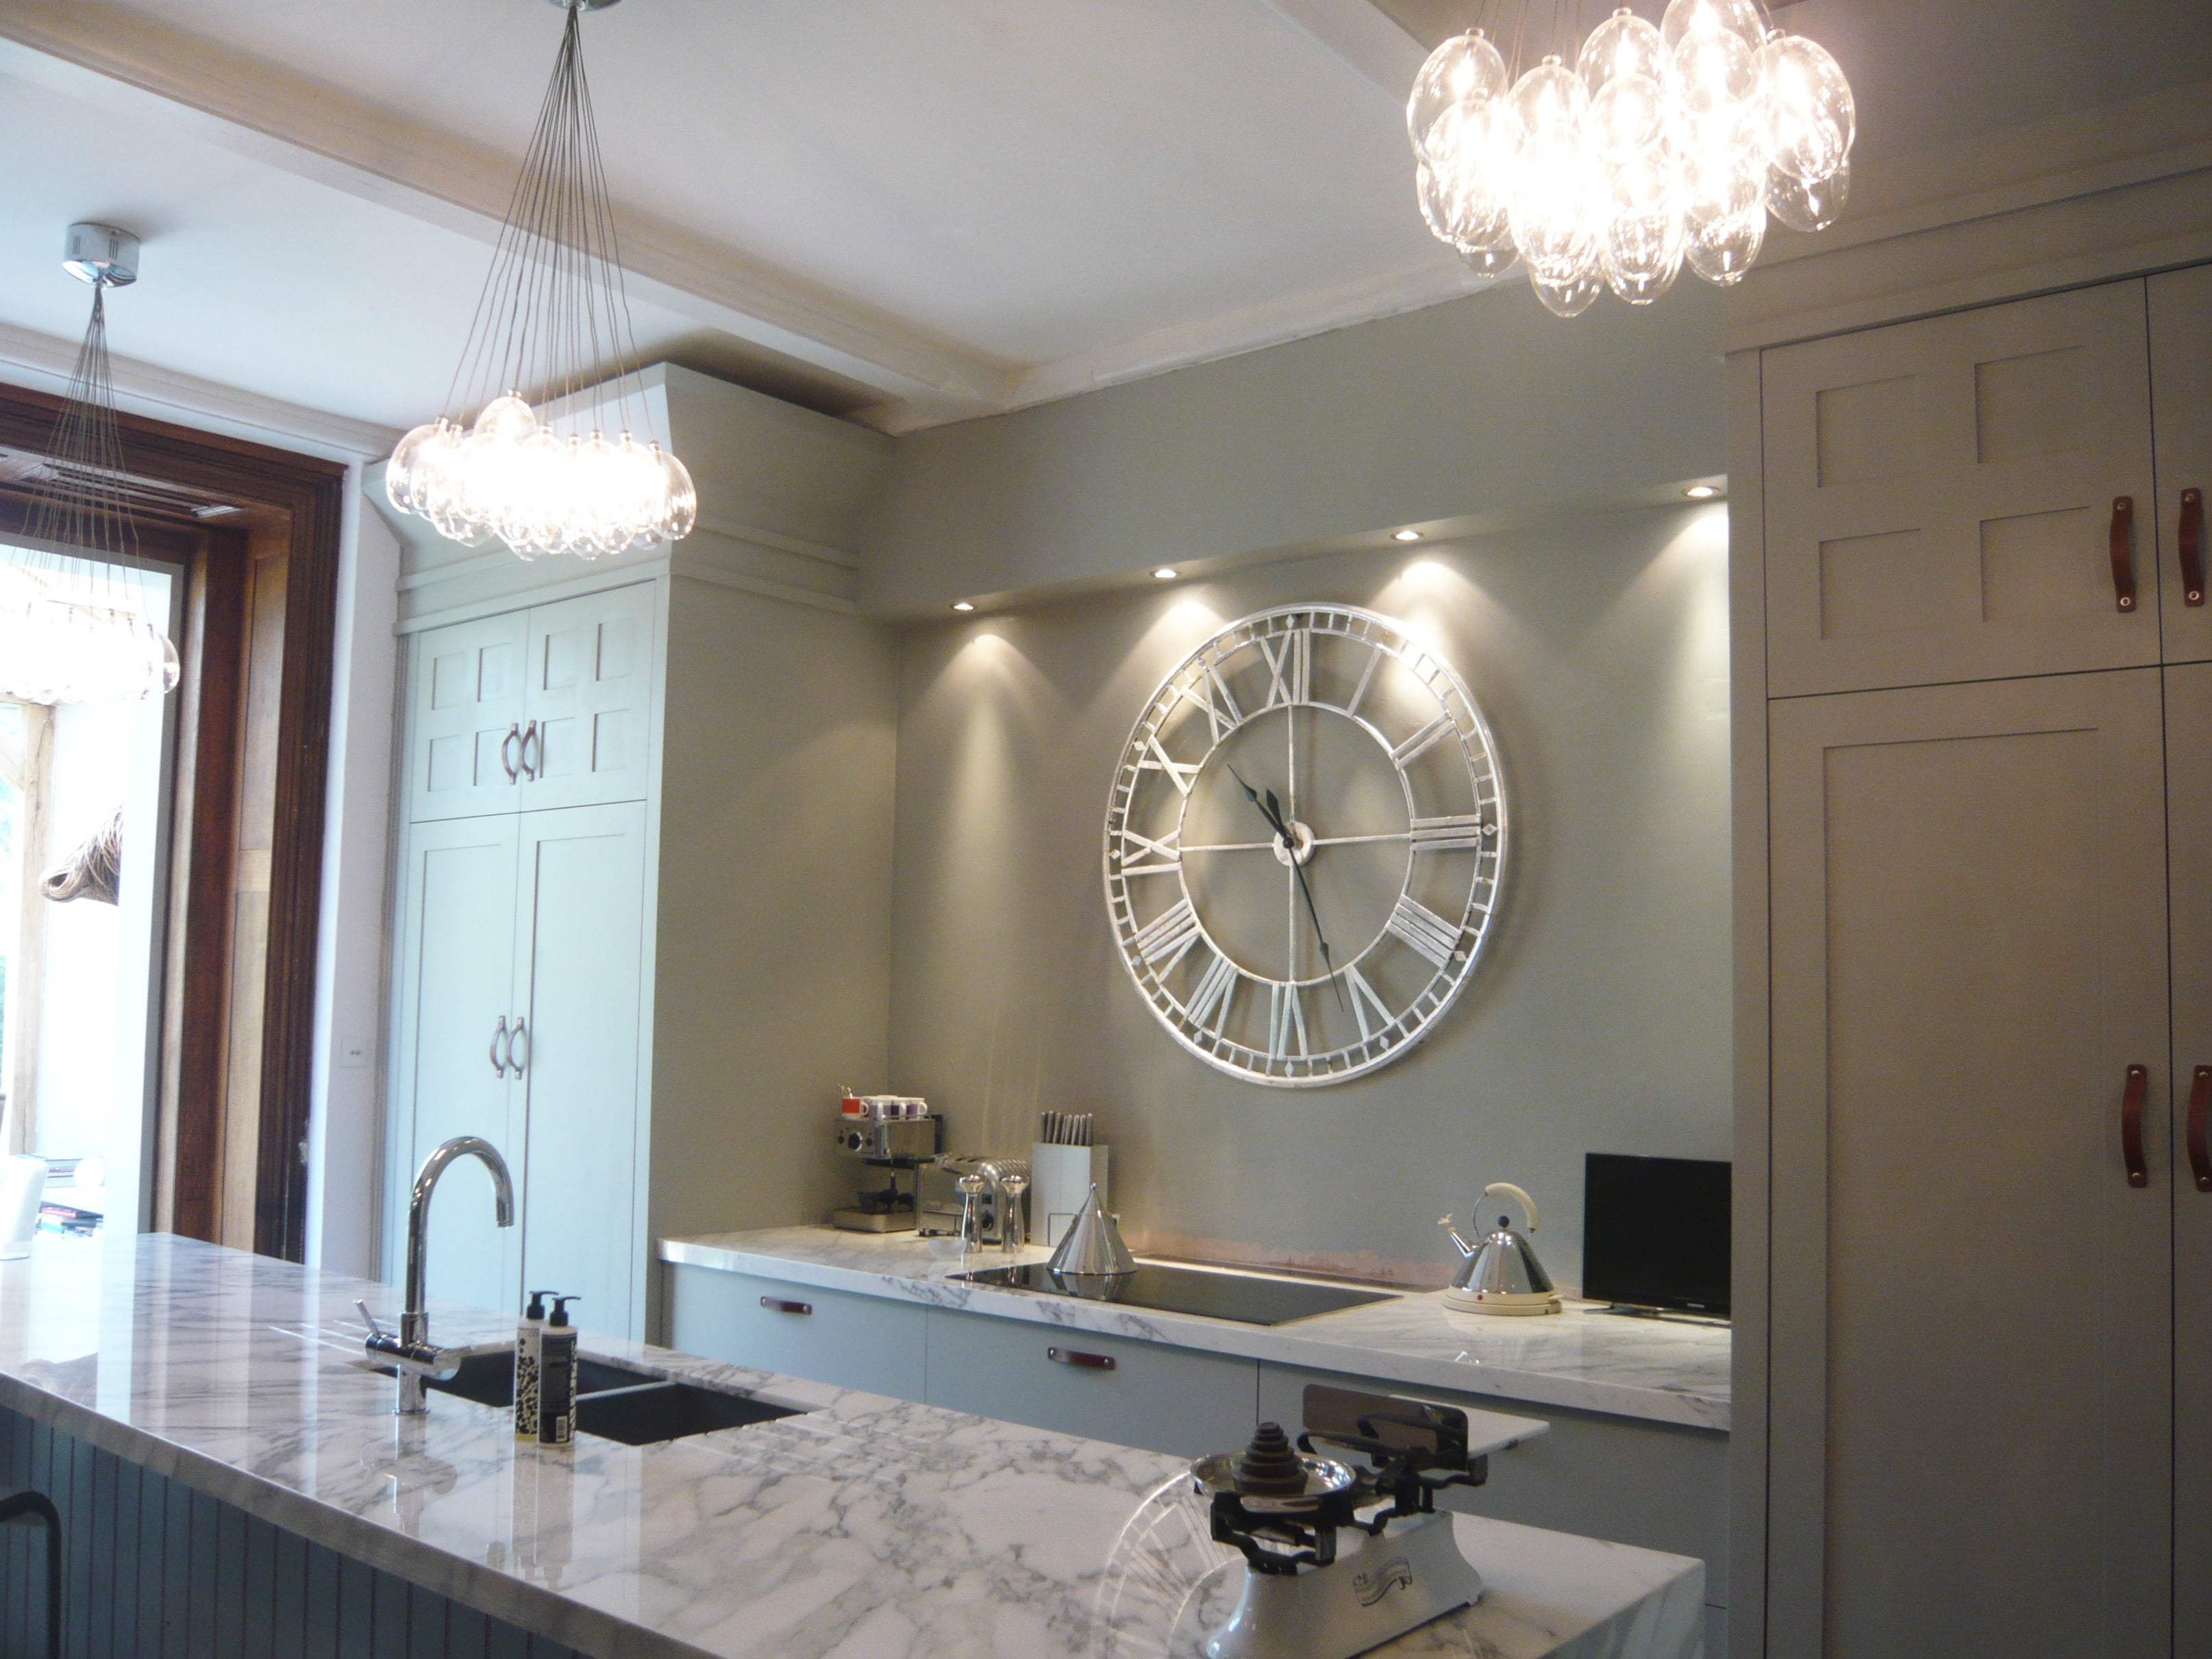 new kitchen by Jo alderson Phillips